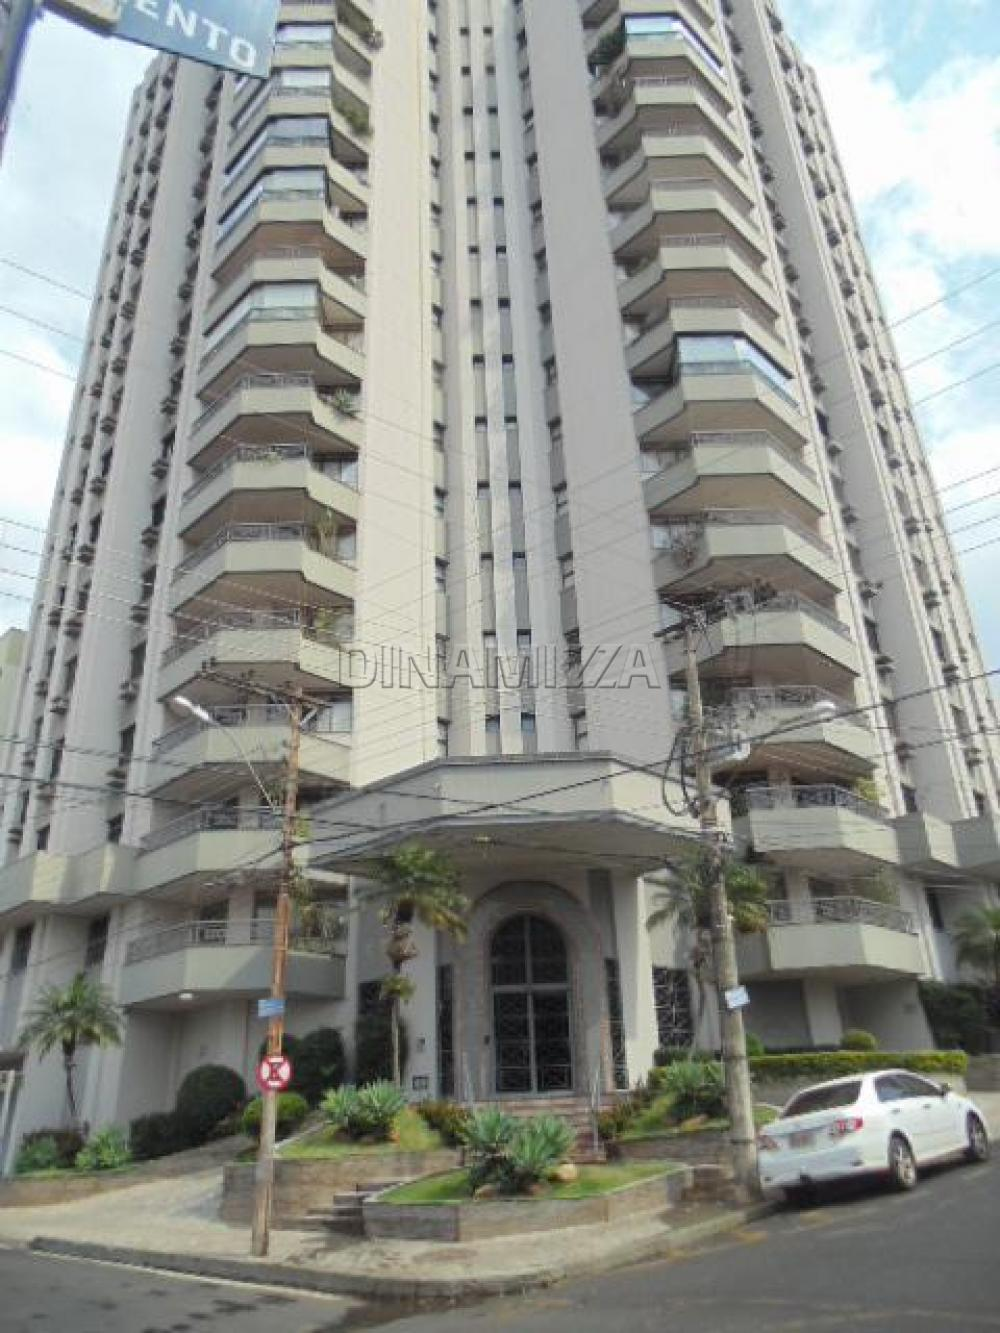 Uberaba Sao Sebastiao Apartamento Venda R$1.200.000,00 Condominio R$2.000,00 5 Dormitorios 3 Vagas